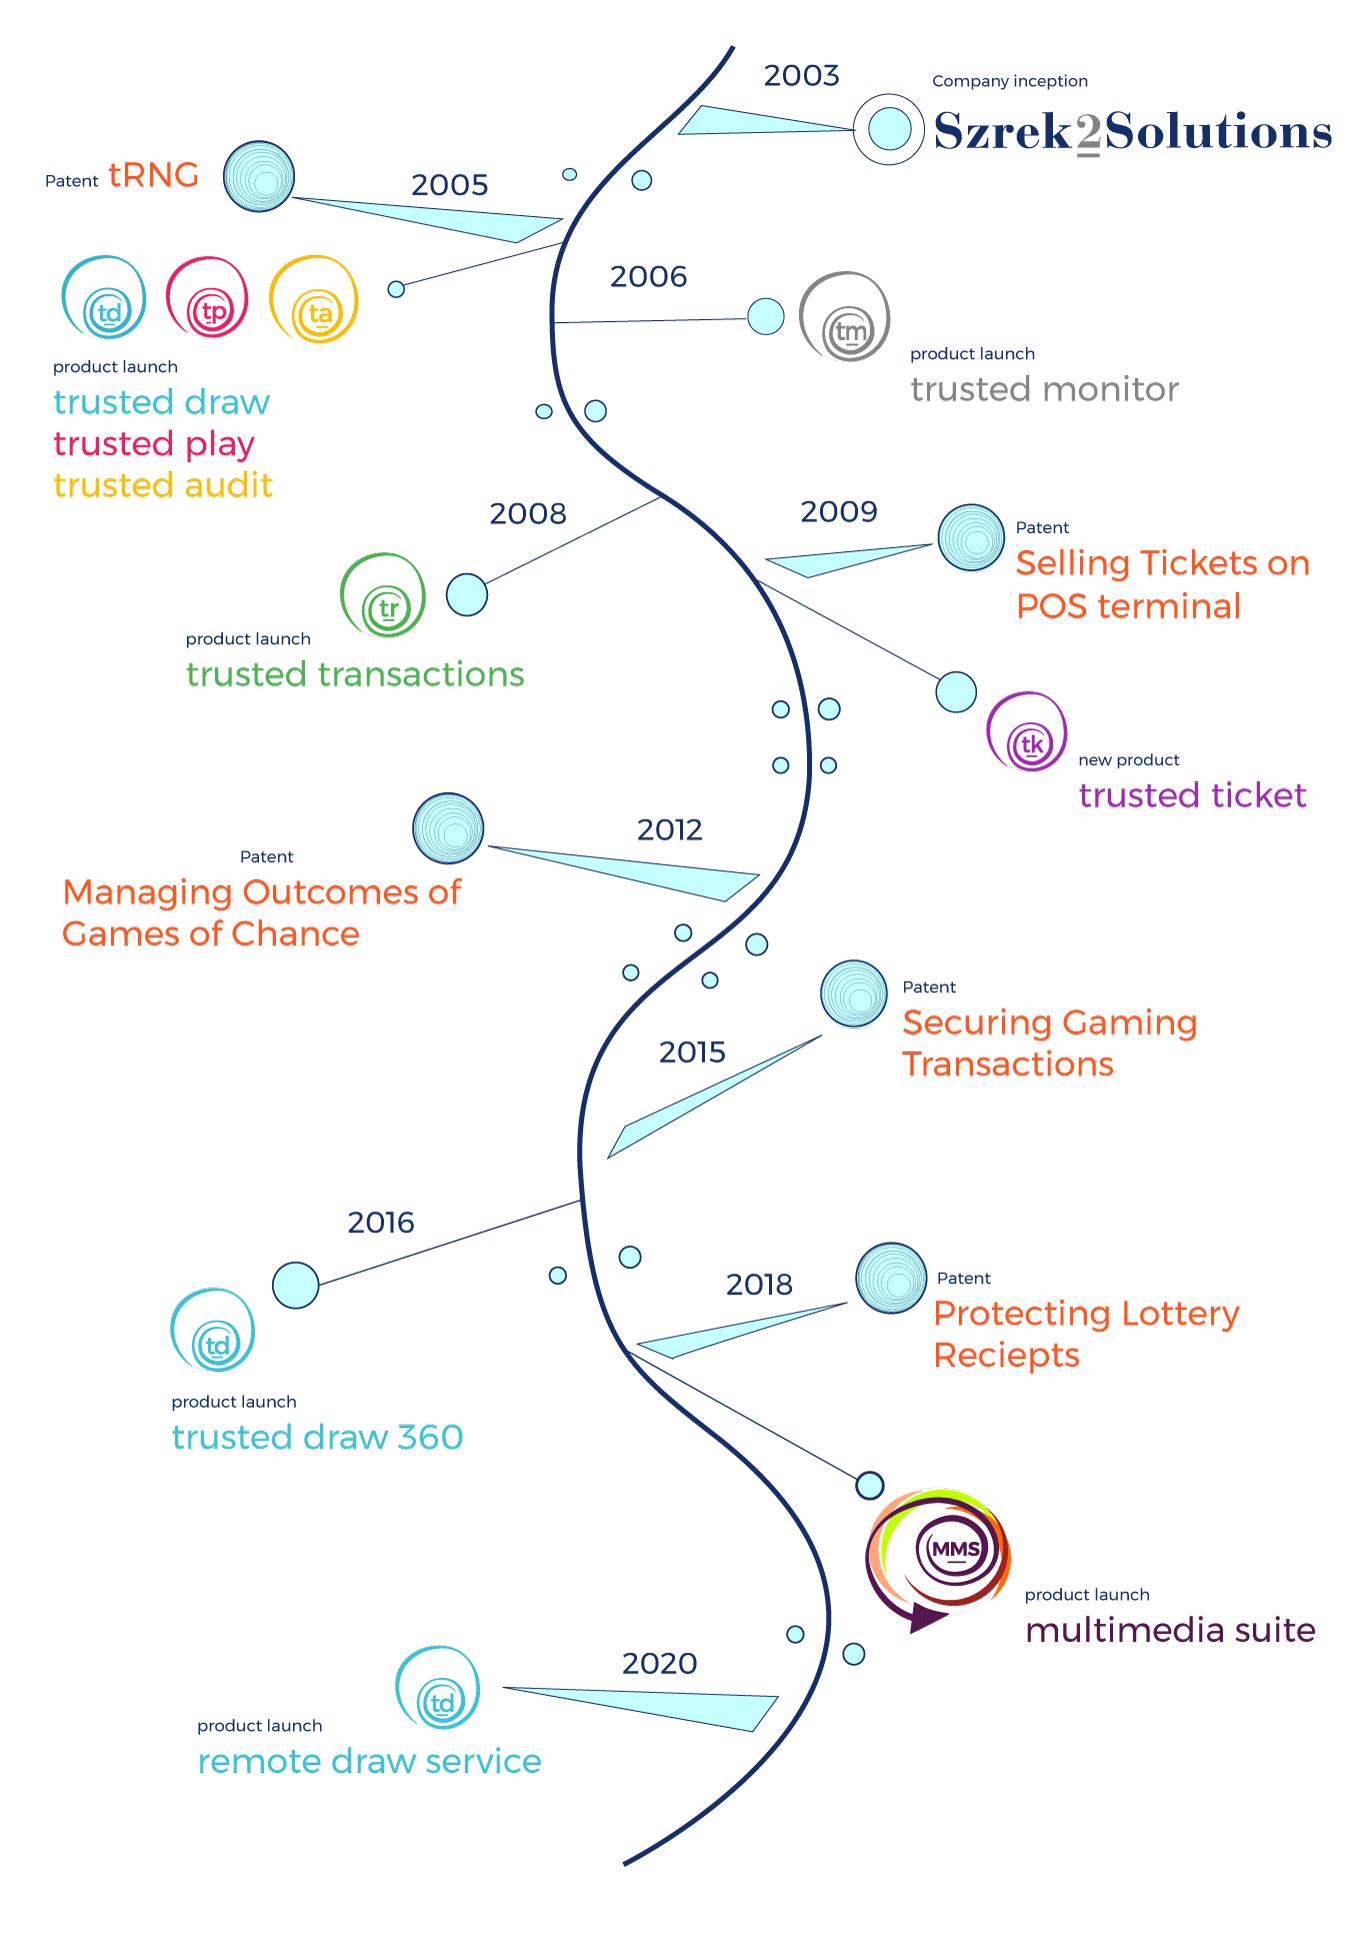 timeline research szrek2solutions